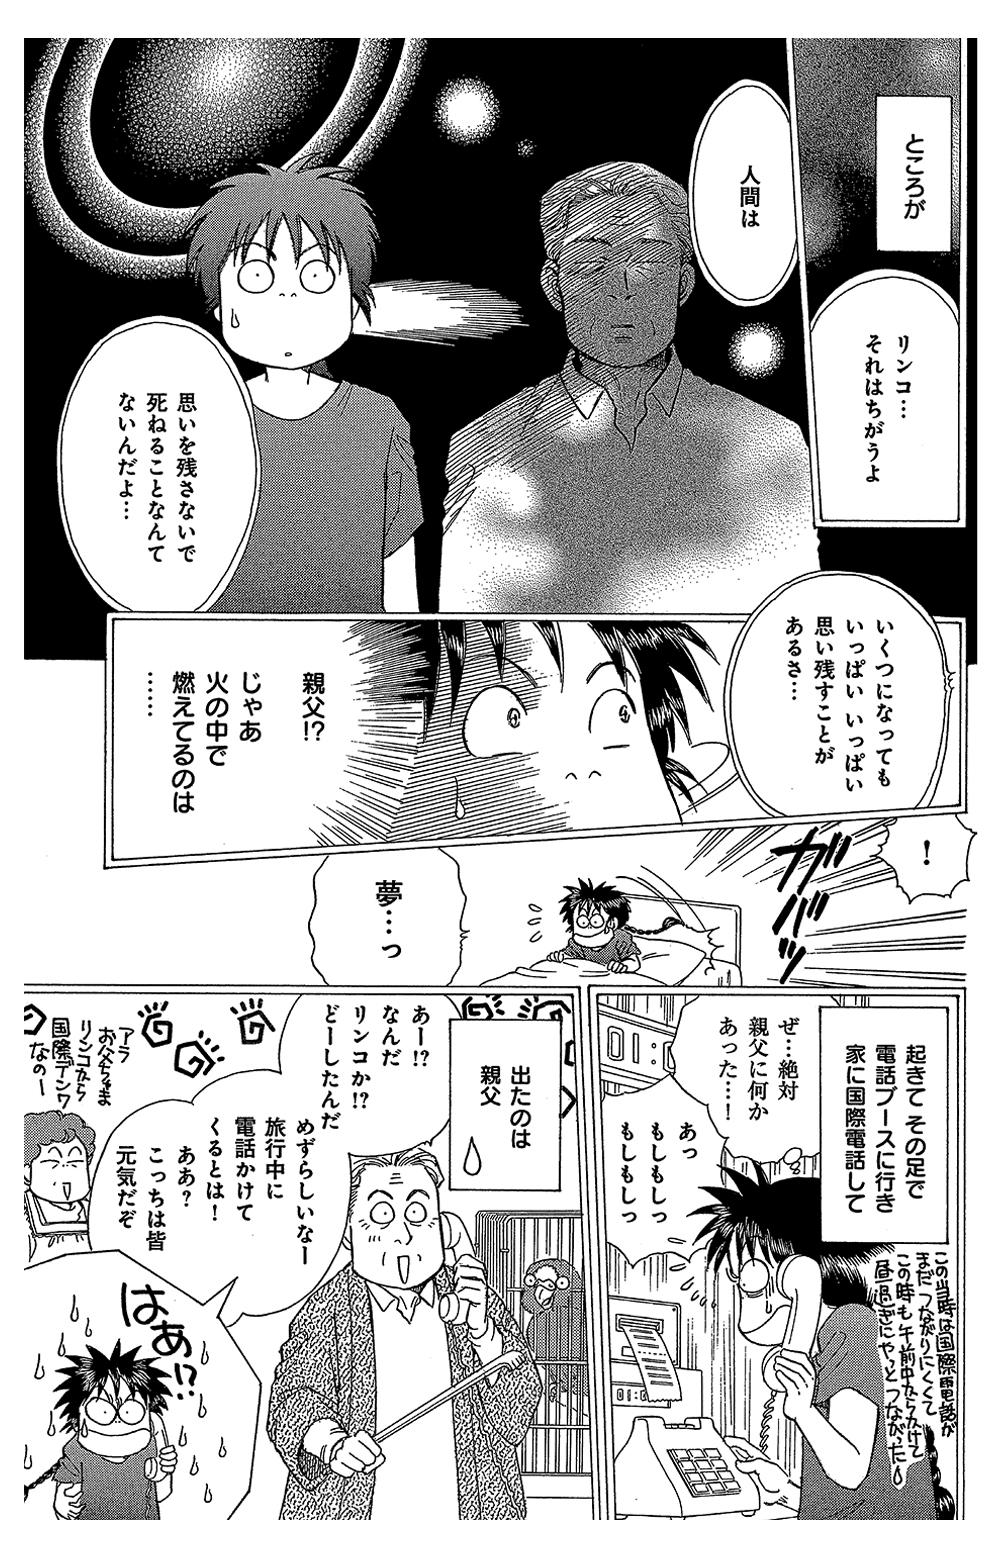 okaruto2-1-7.jpg